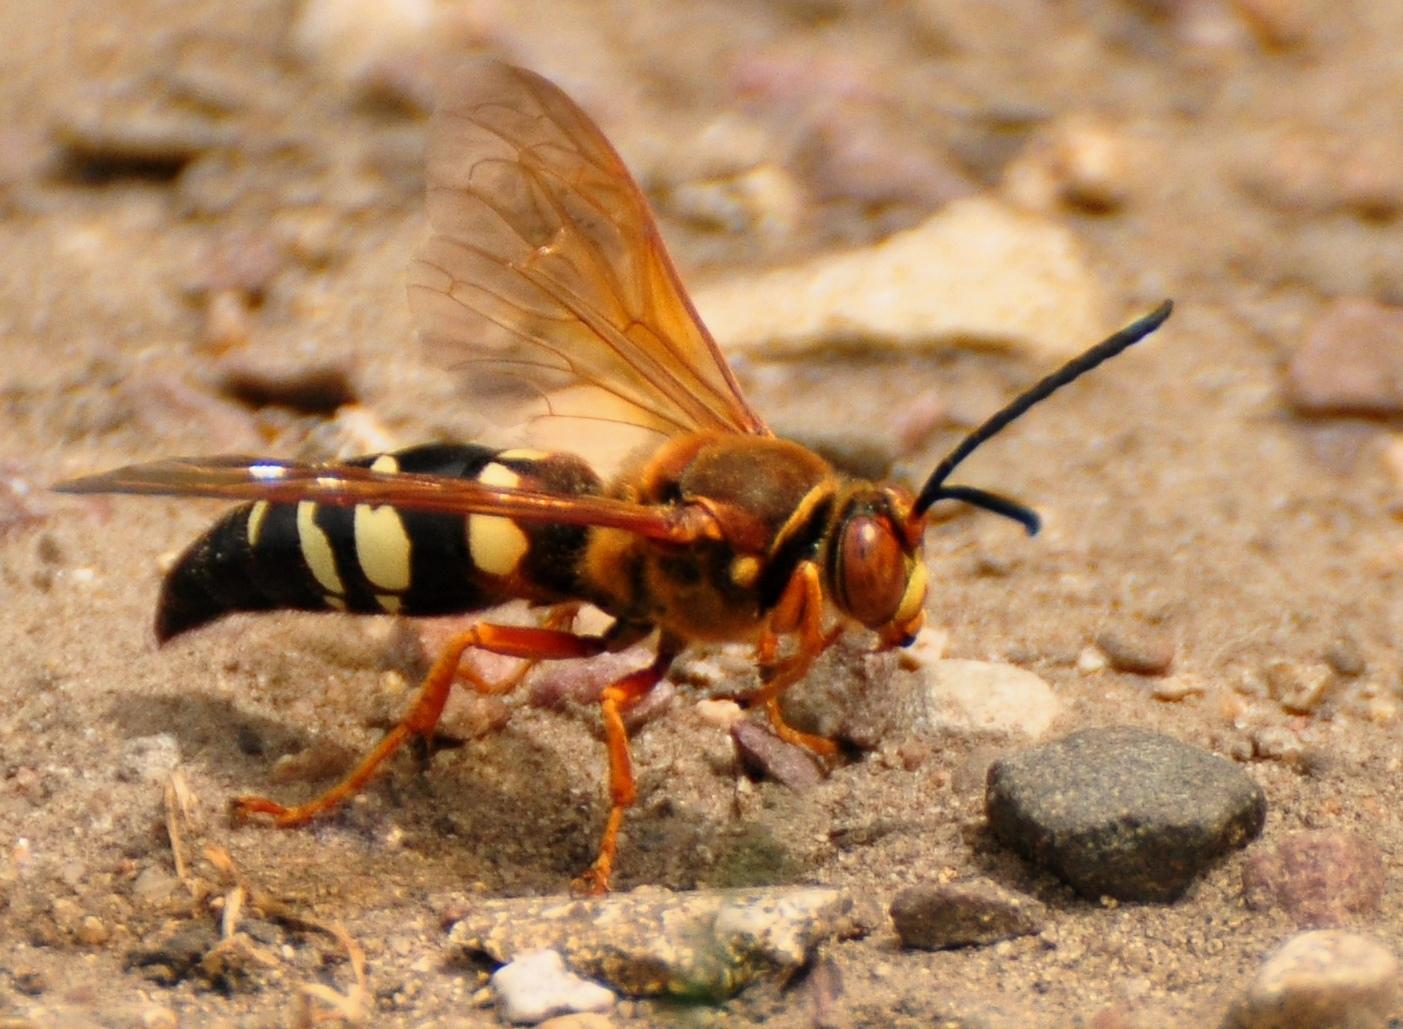 A cicada-killer wasp up close